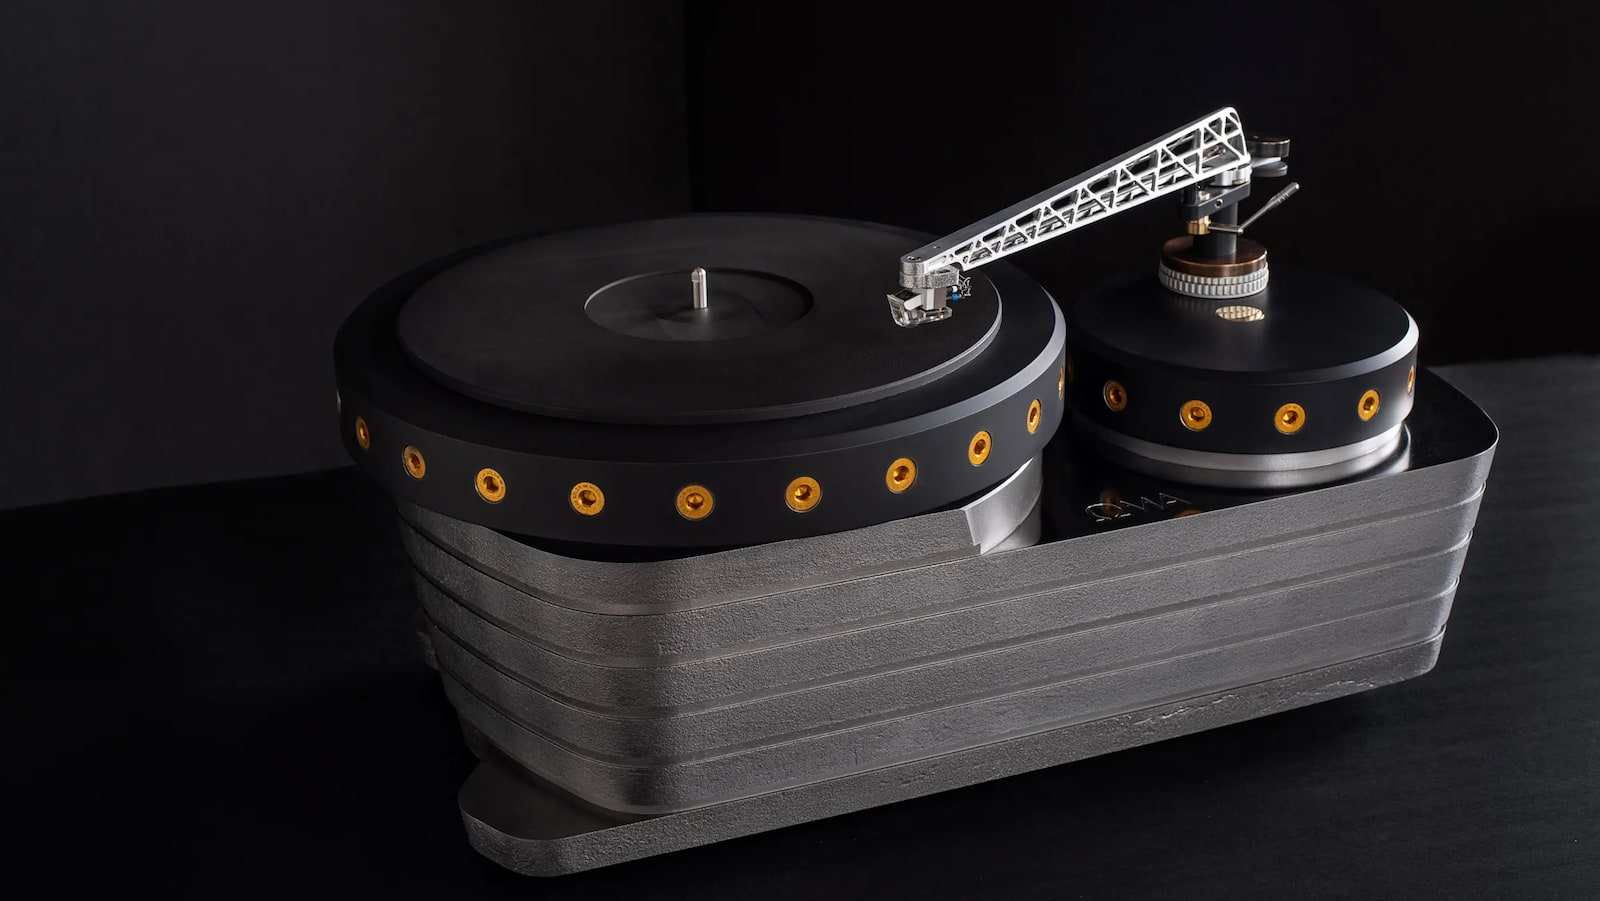 Oswalds-Mill-Audio-K3-Cast-Iron-Turntable-02.jpg